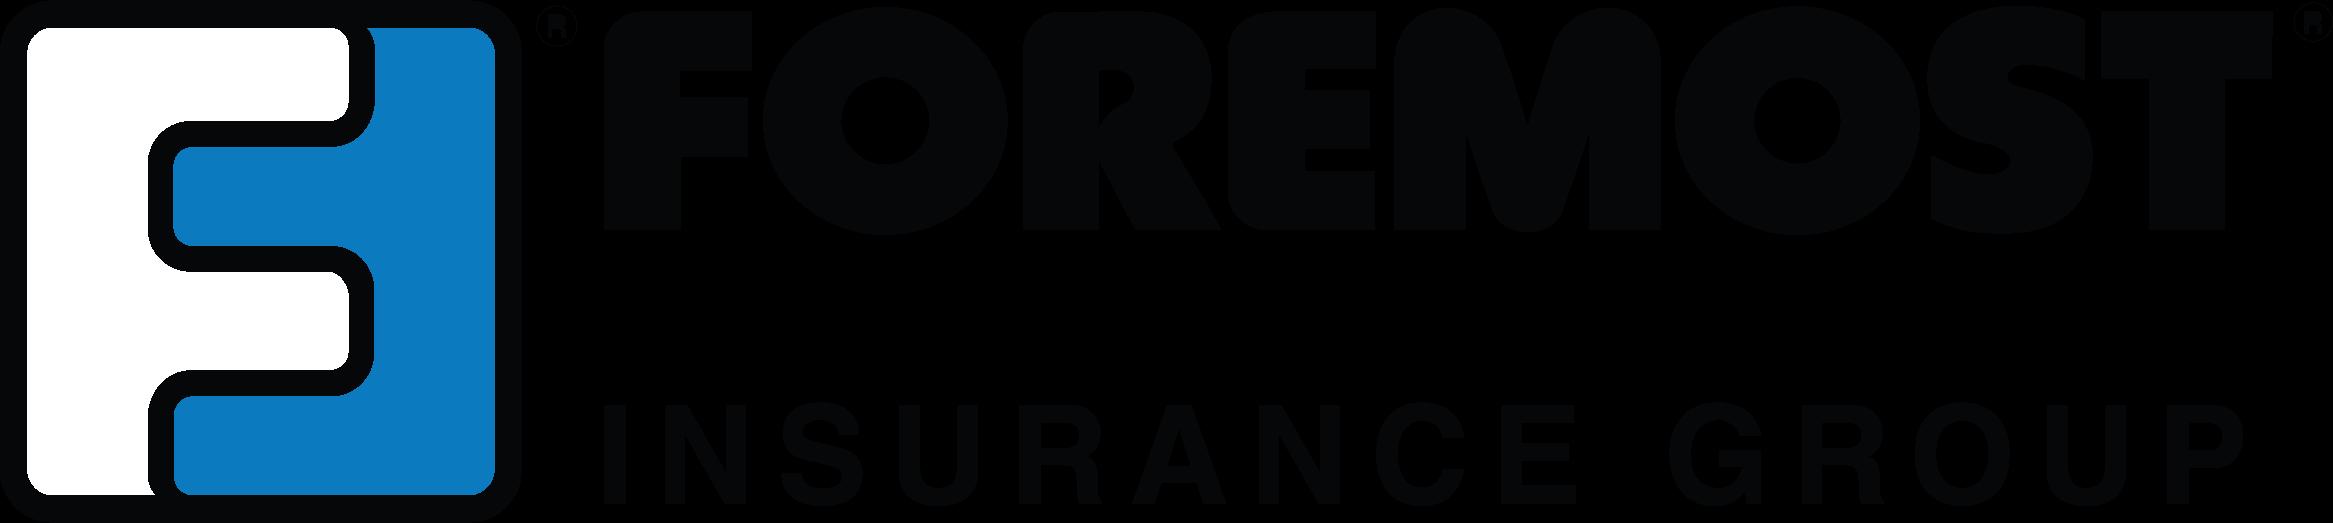 1578166865_foremost_logo